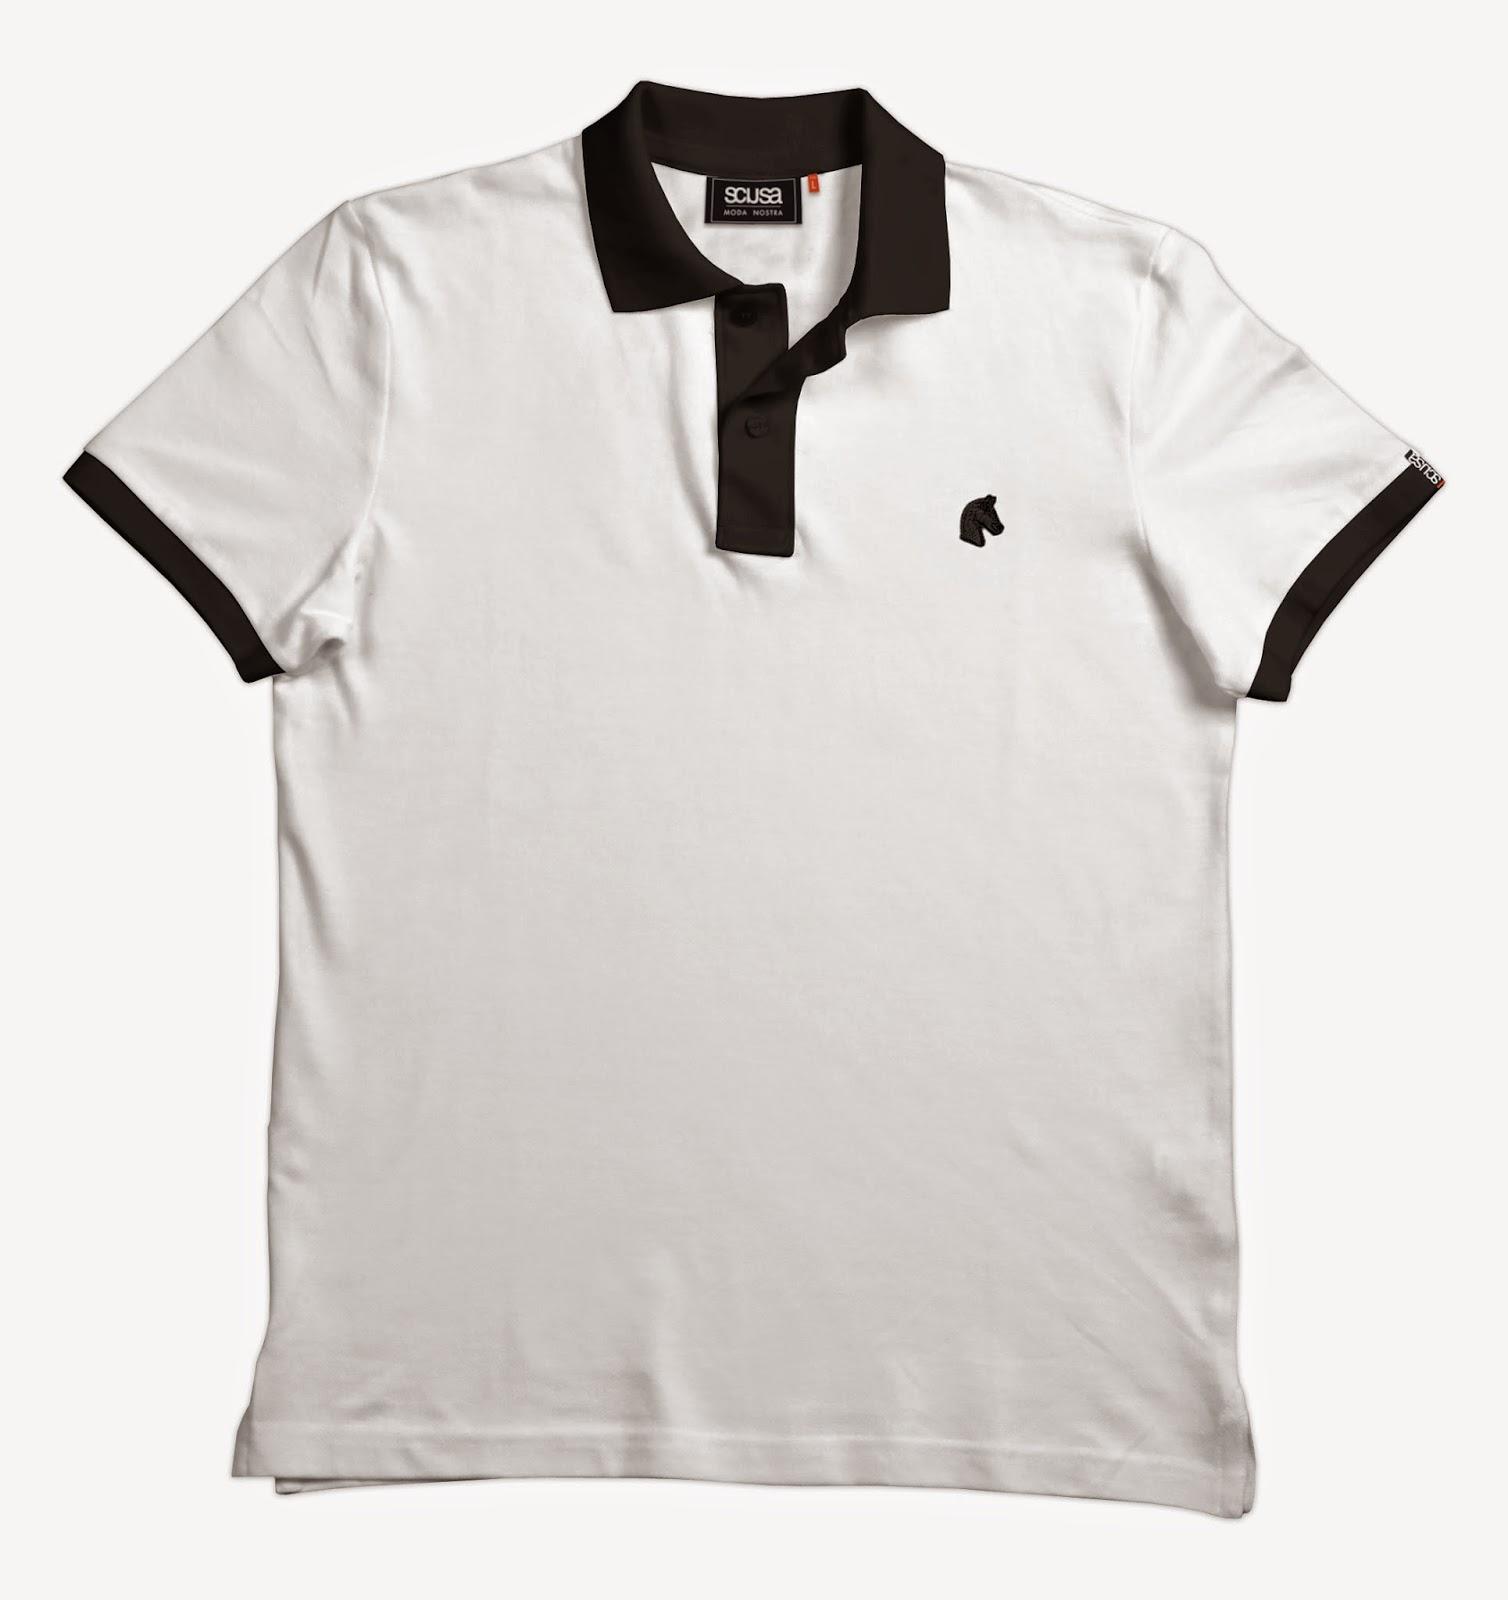 Scusa Moda Nostra T Shirt